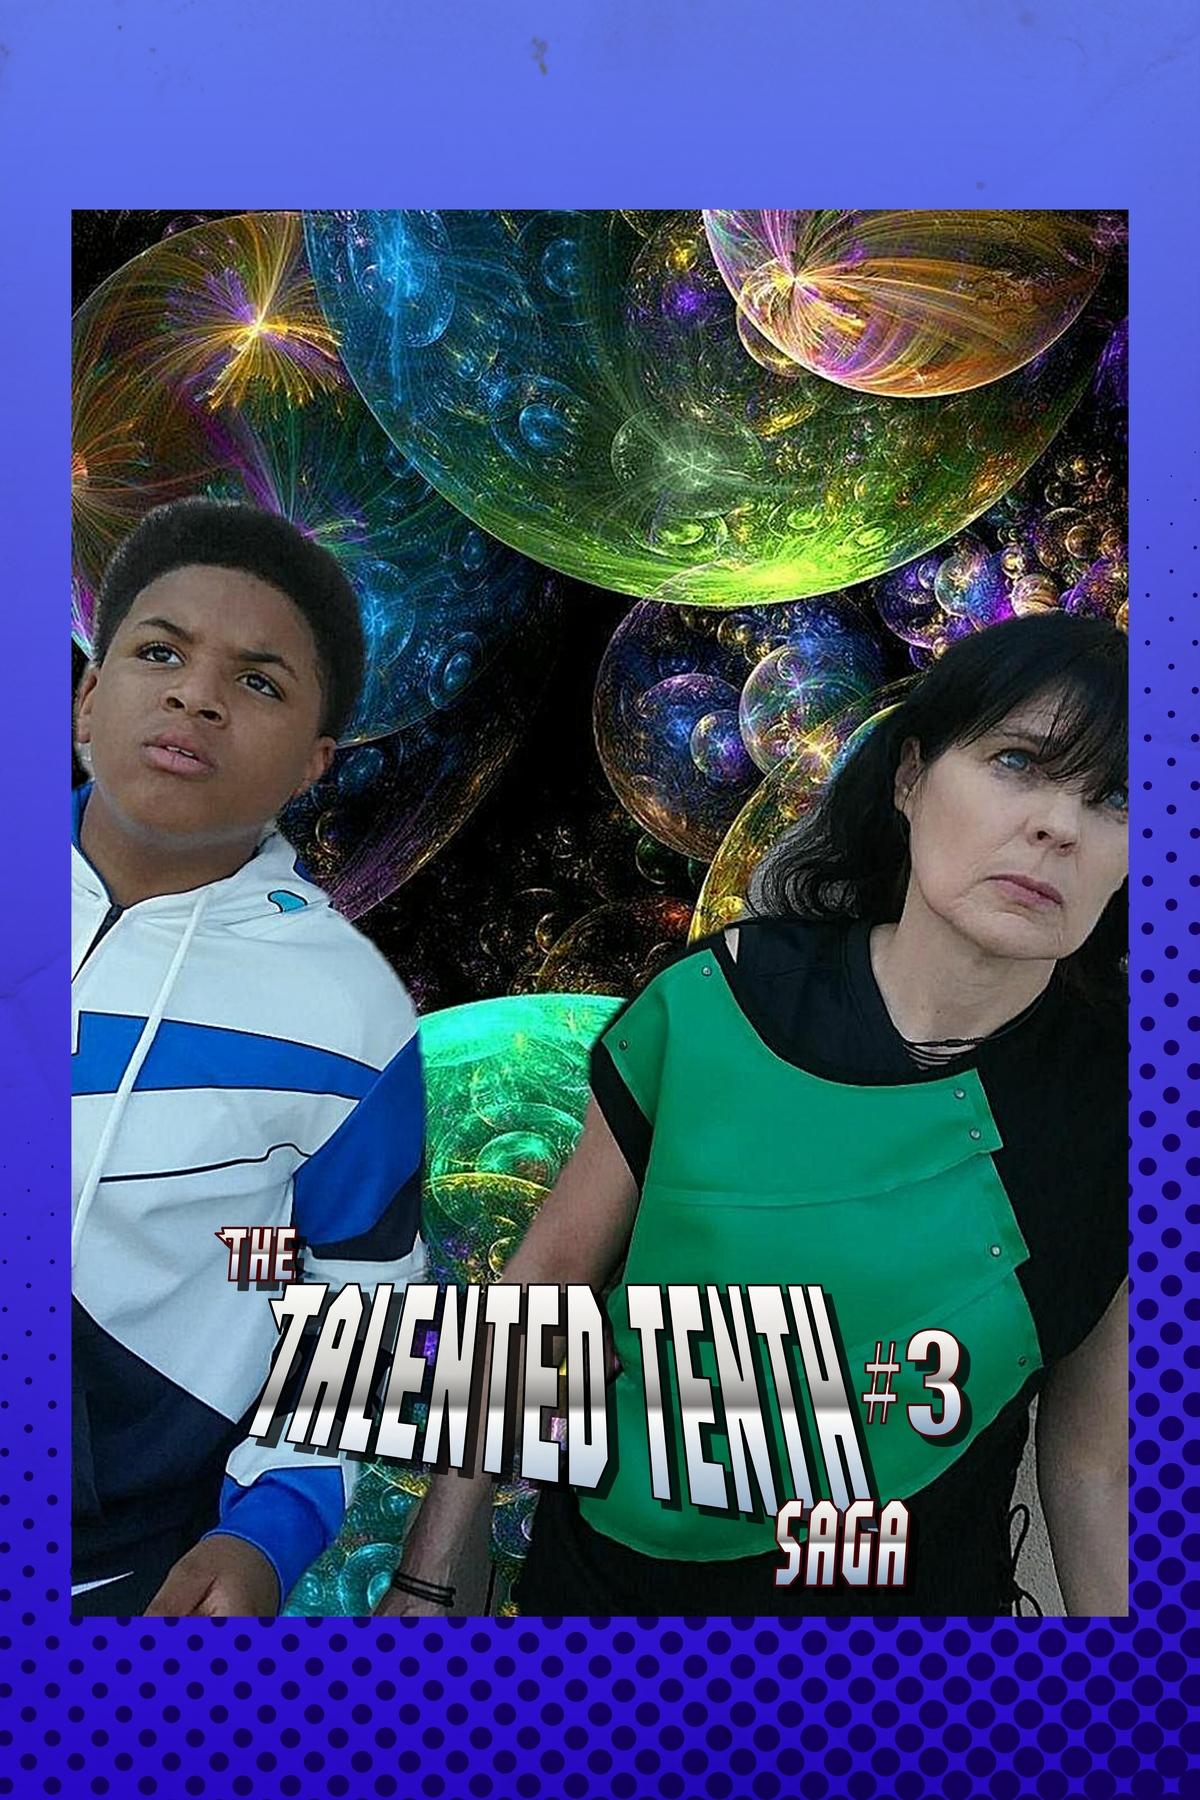 The Talented Tenth Saga #1-8